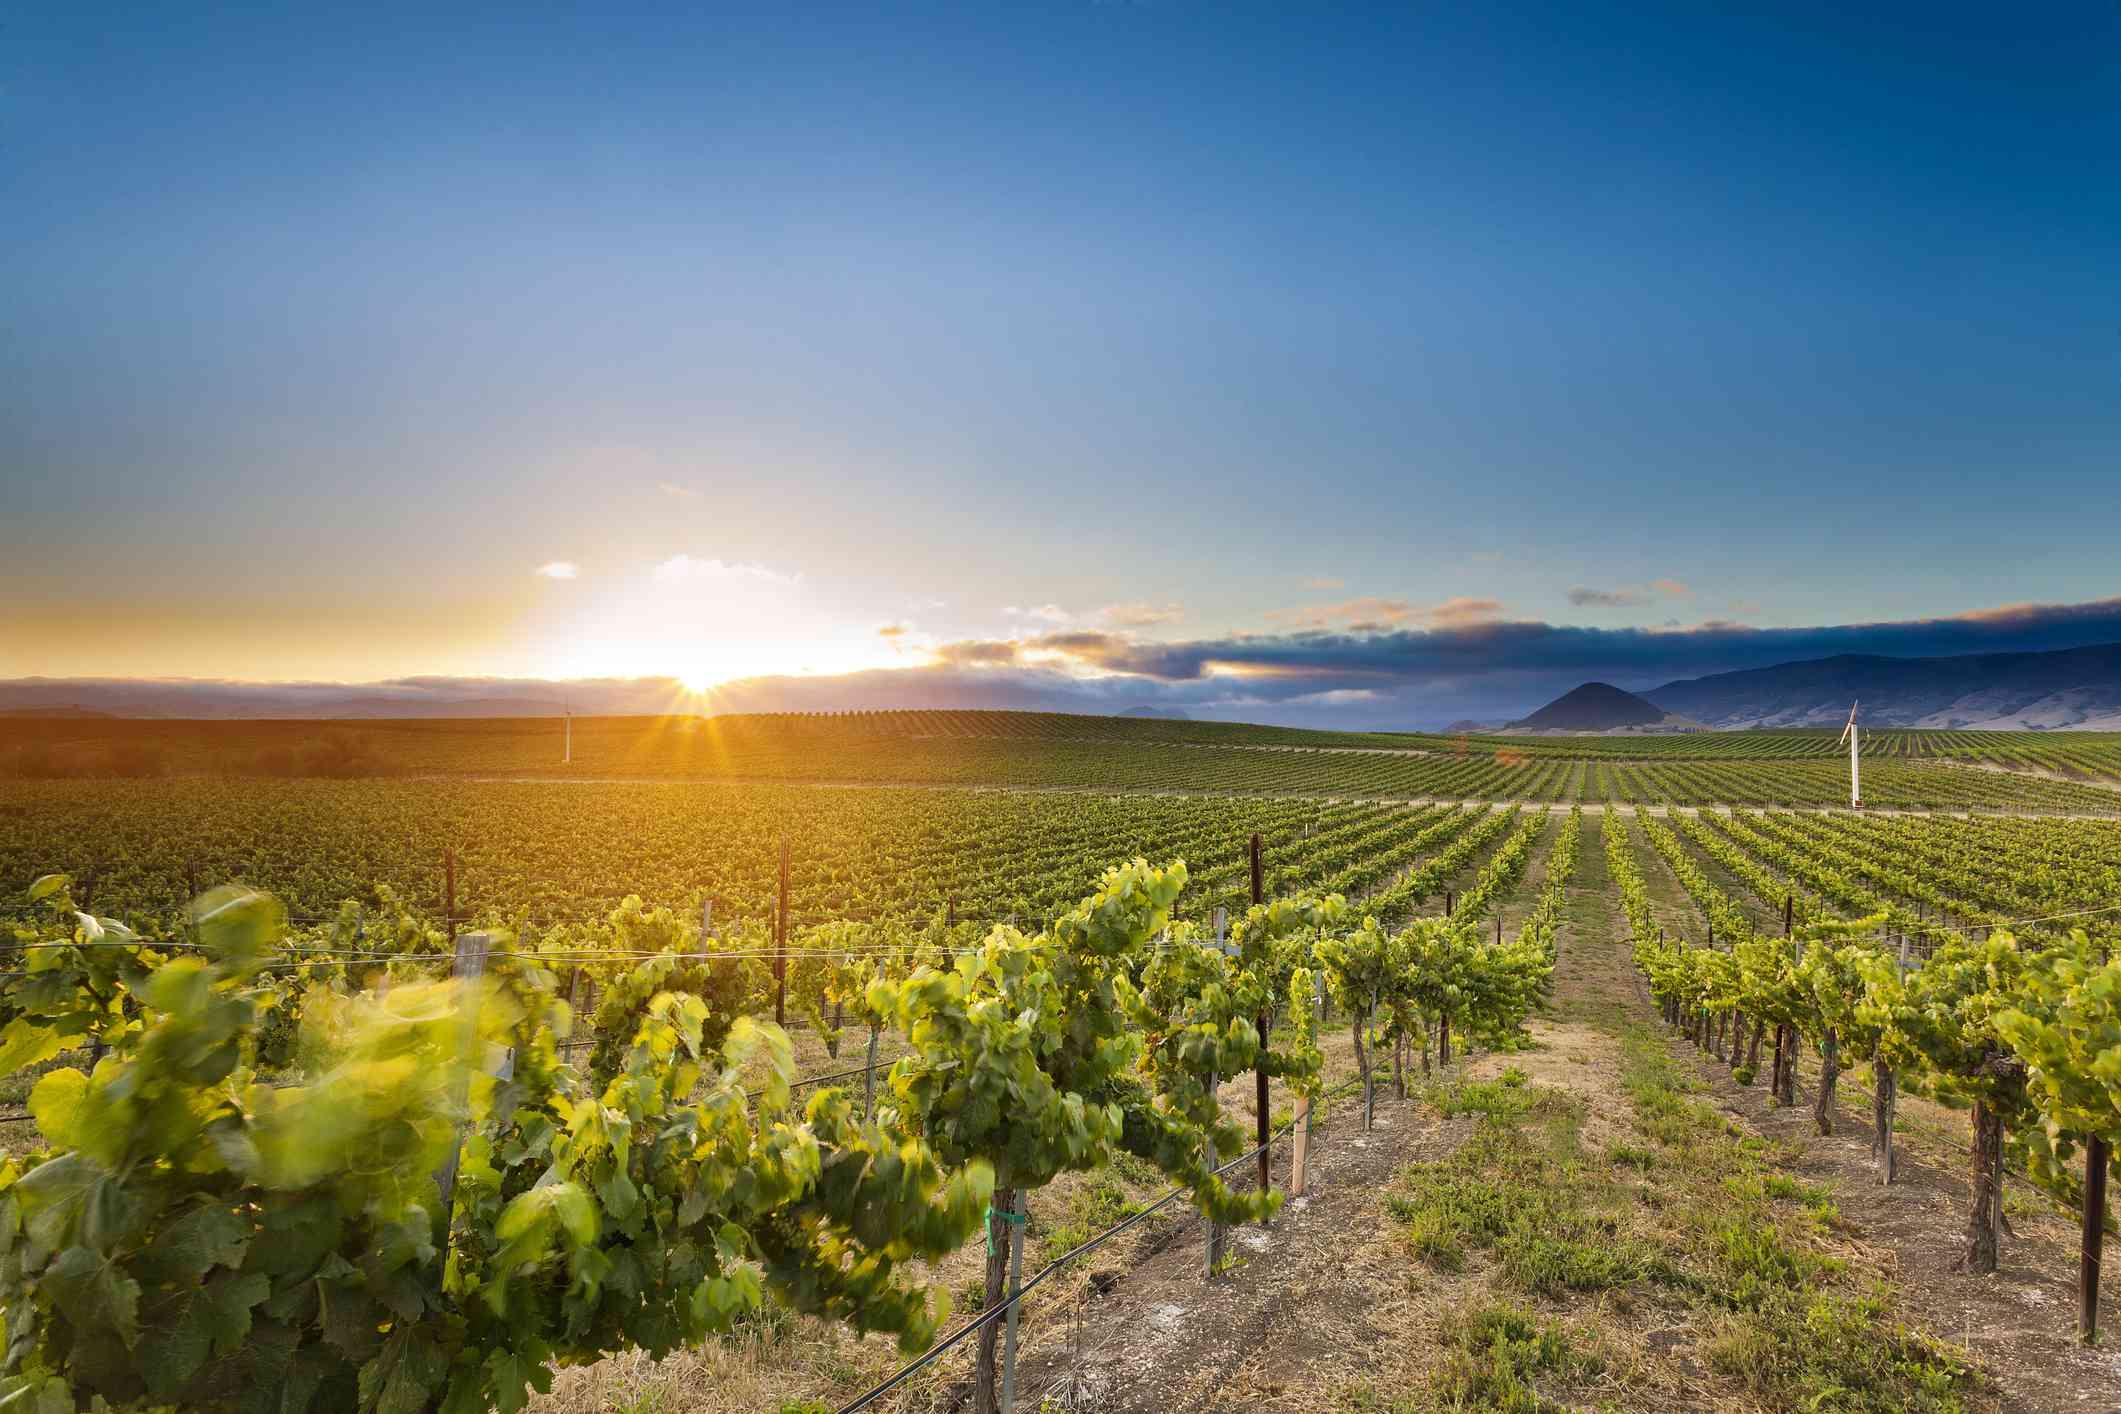 12 Things to Do in San Luis Obispo